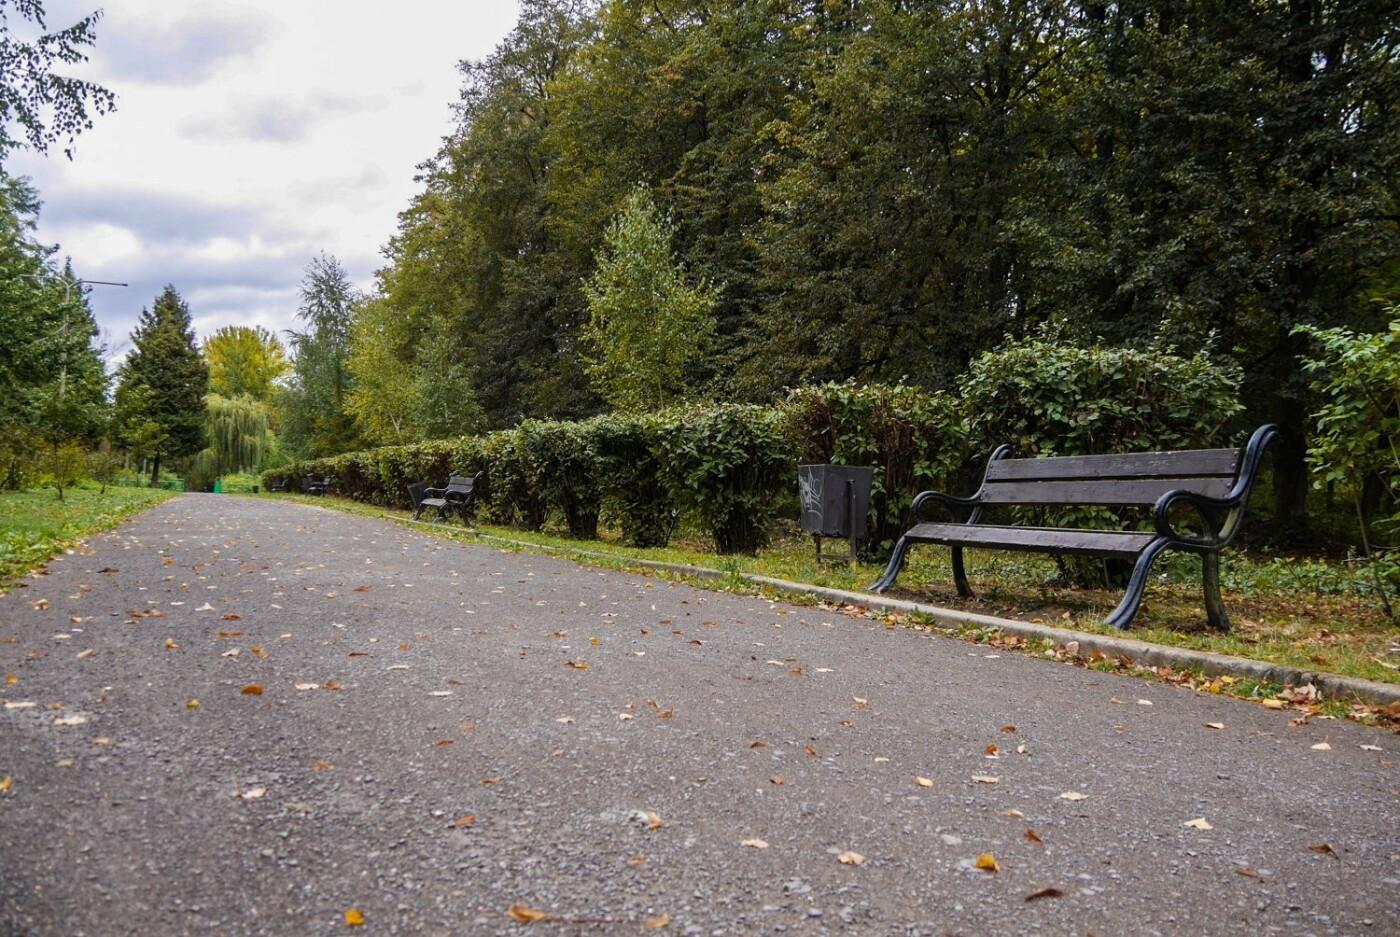 Ще одну алею у Боздоському парку Ужгорода привели до ладу (ФОТО), фото-3